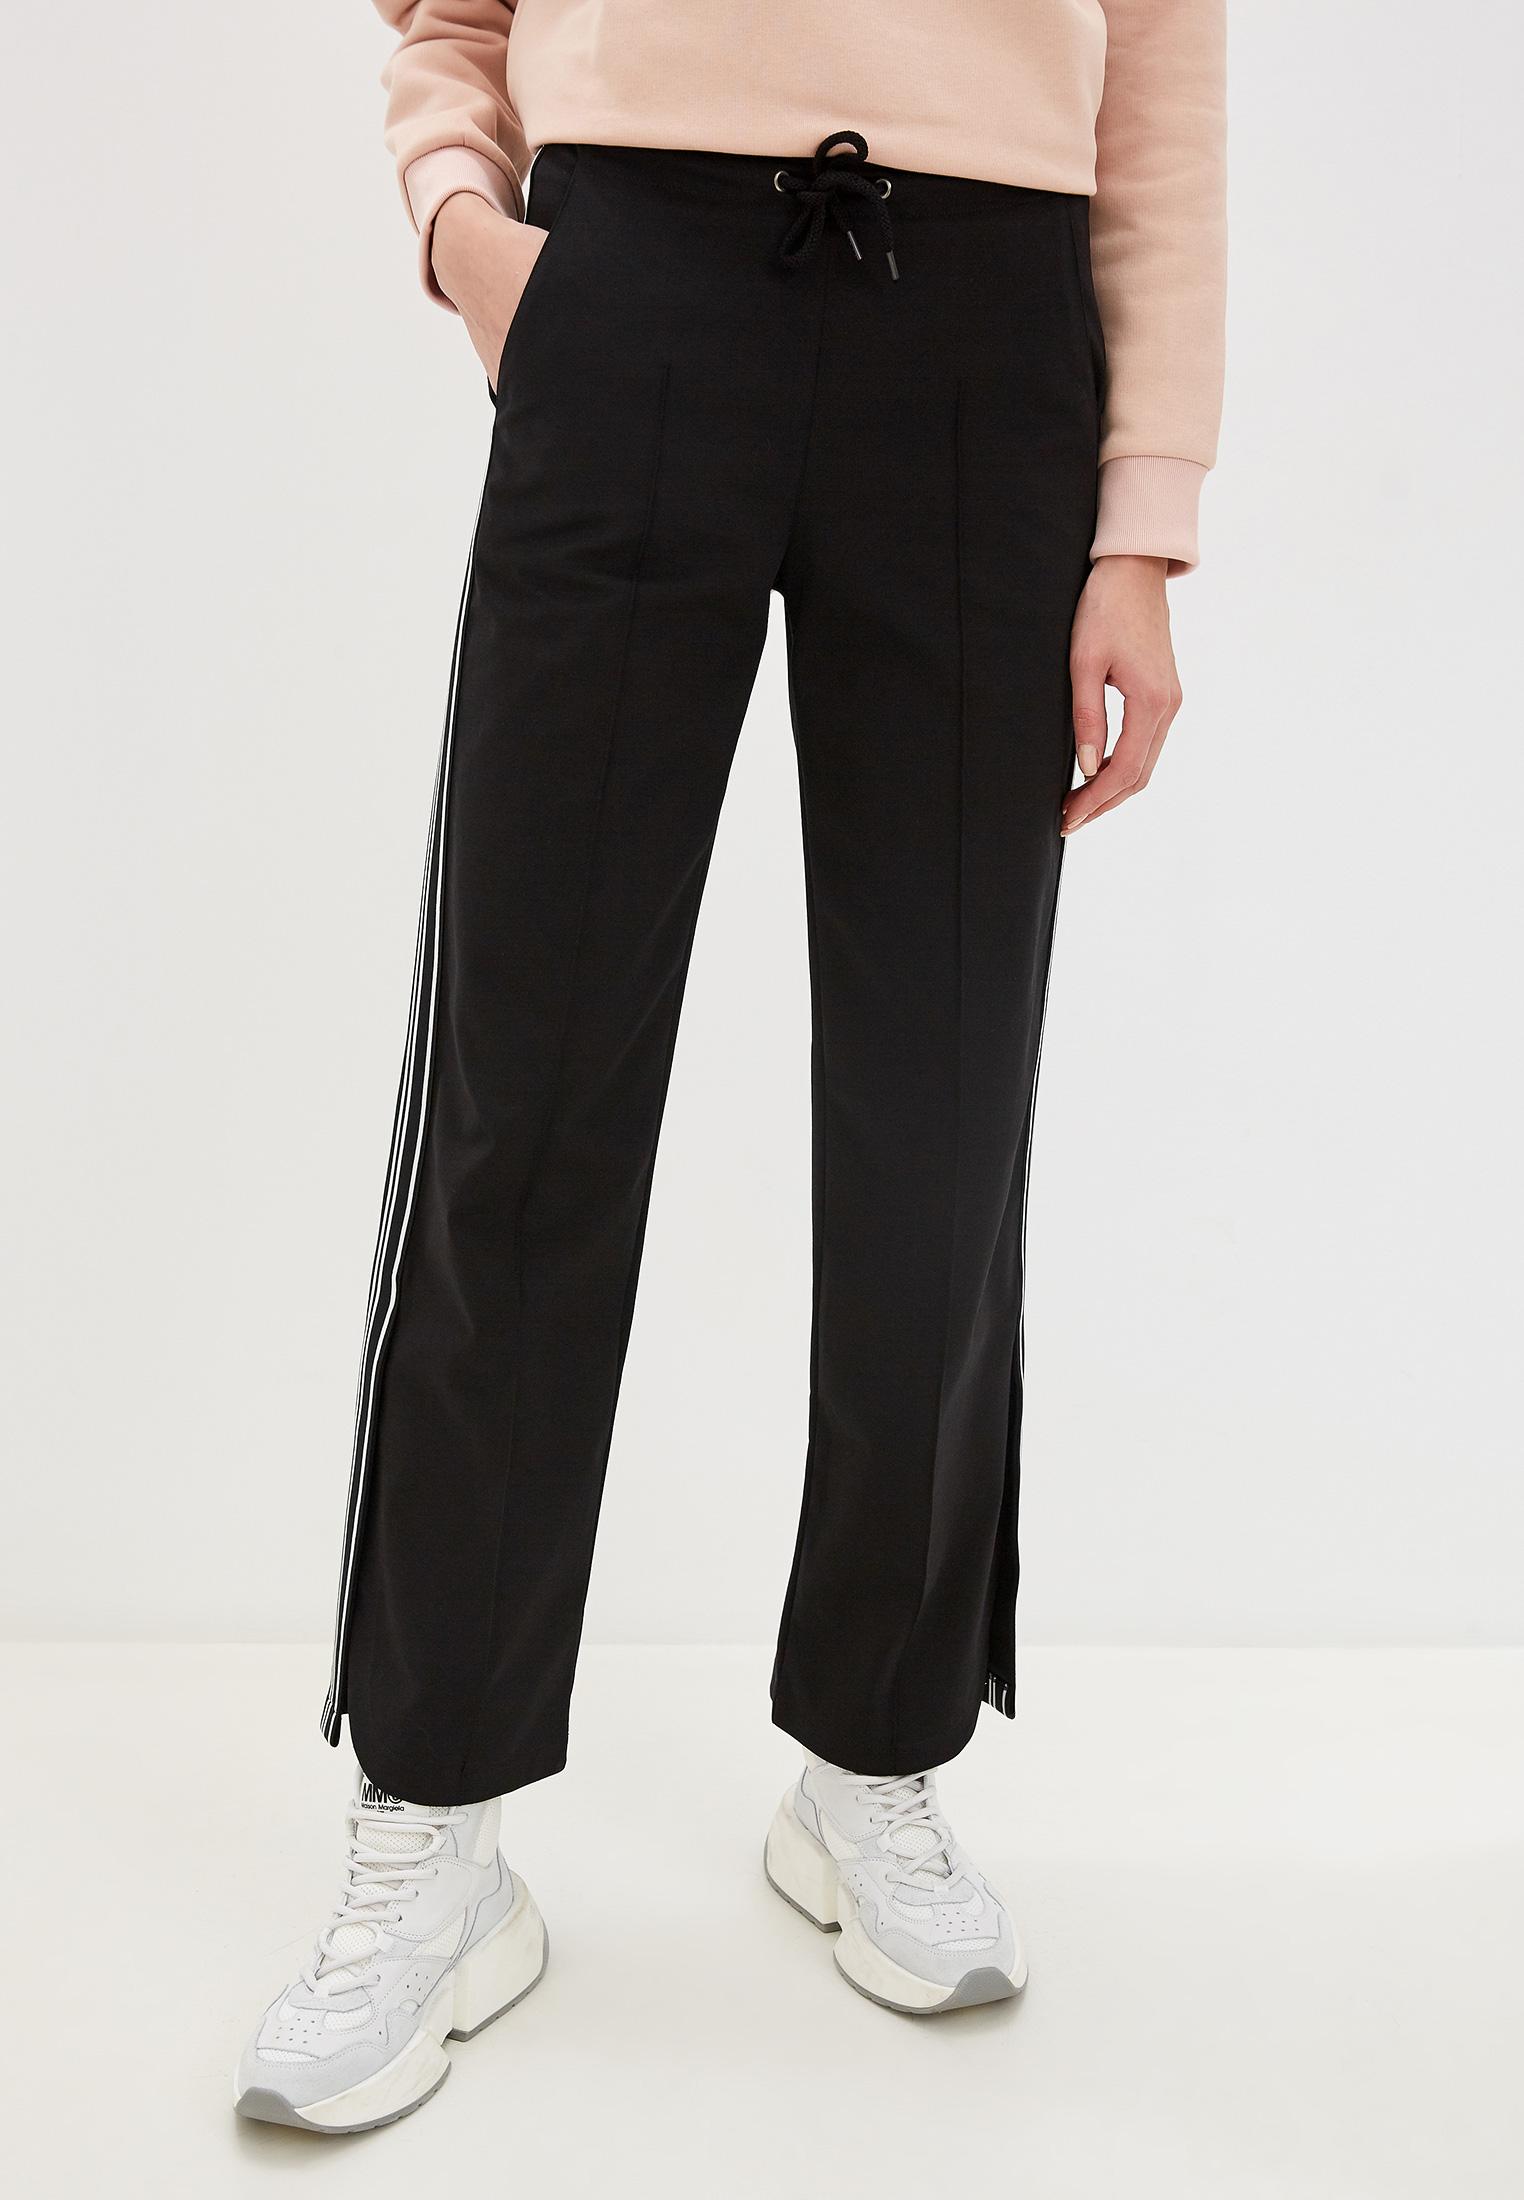 Женские спортивные брюки Bikkembergs D 1 034 01 E 2031